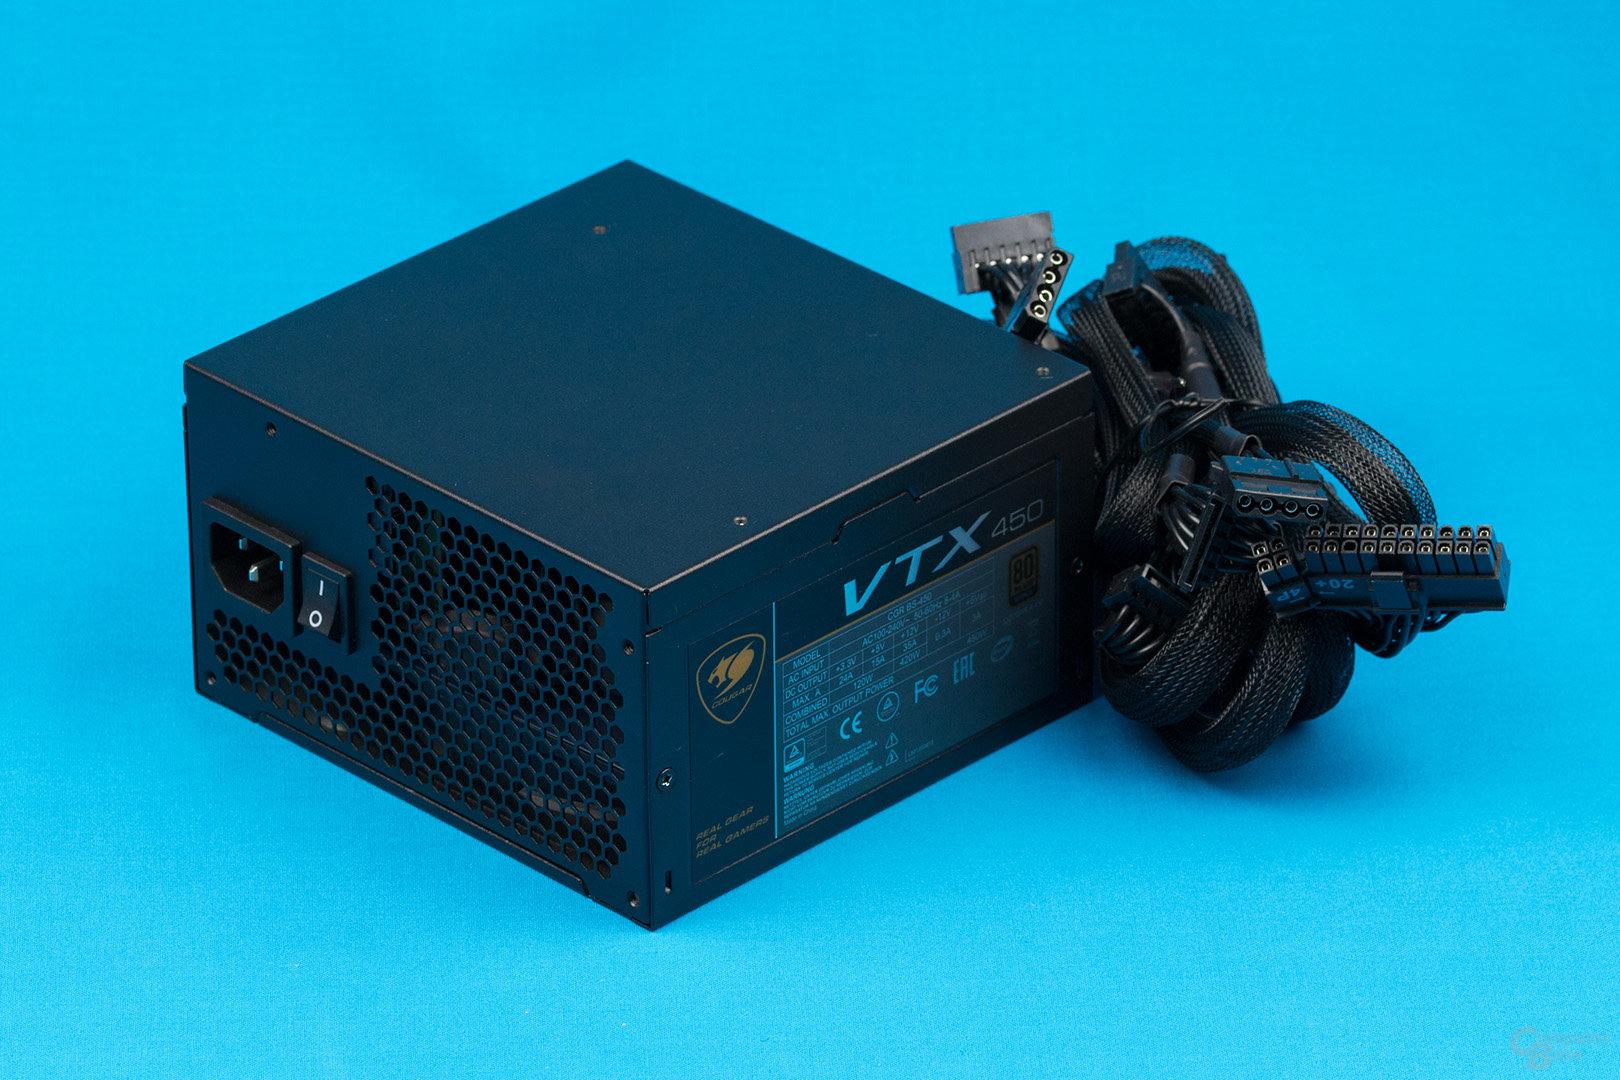 Cougar VTX 450W